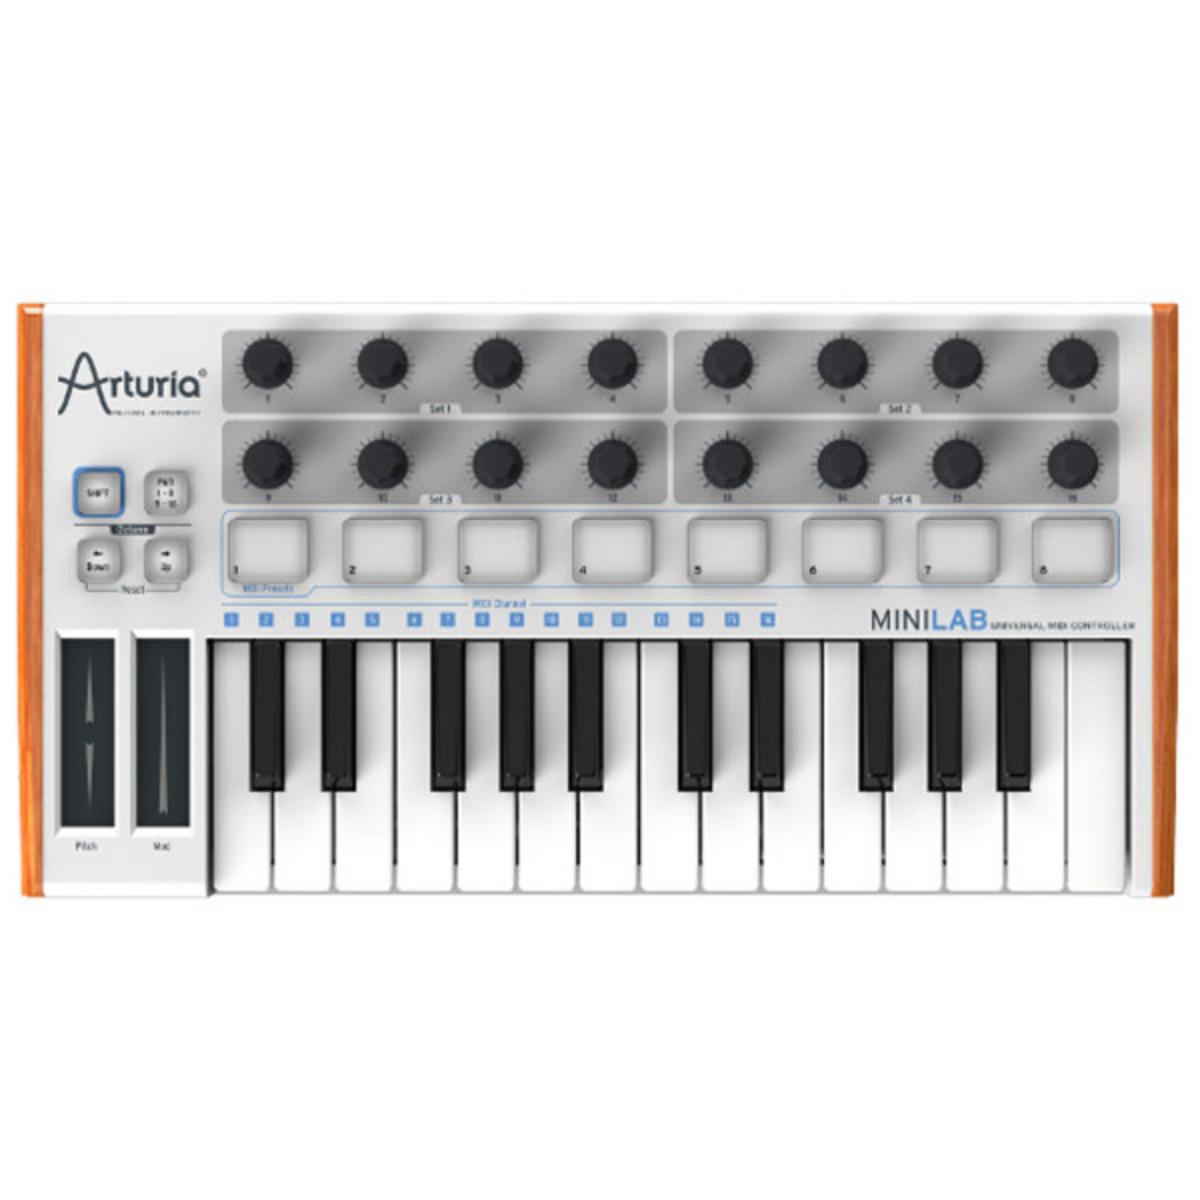 Image of Arturia MiniLab Universal MIDI Controller